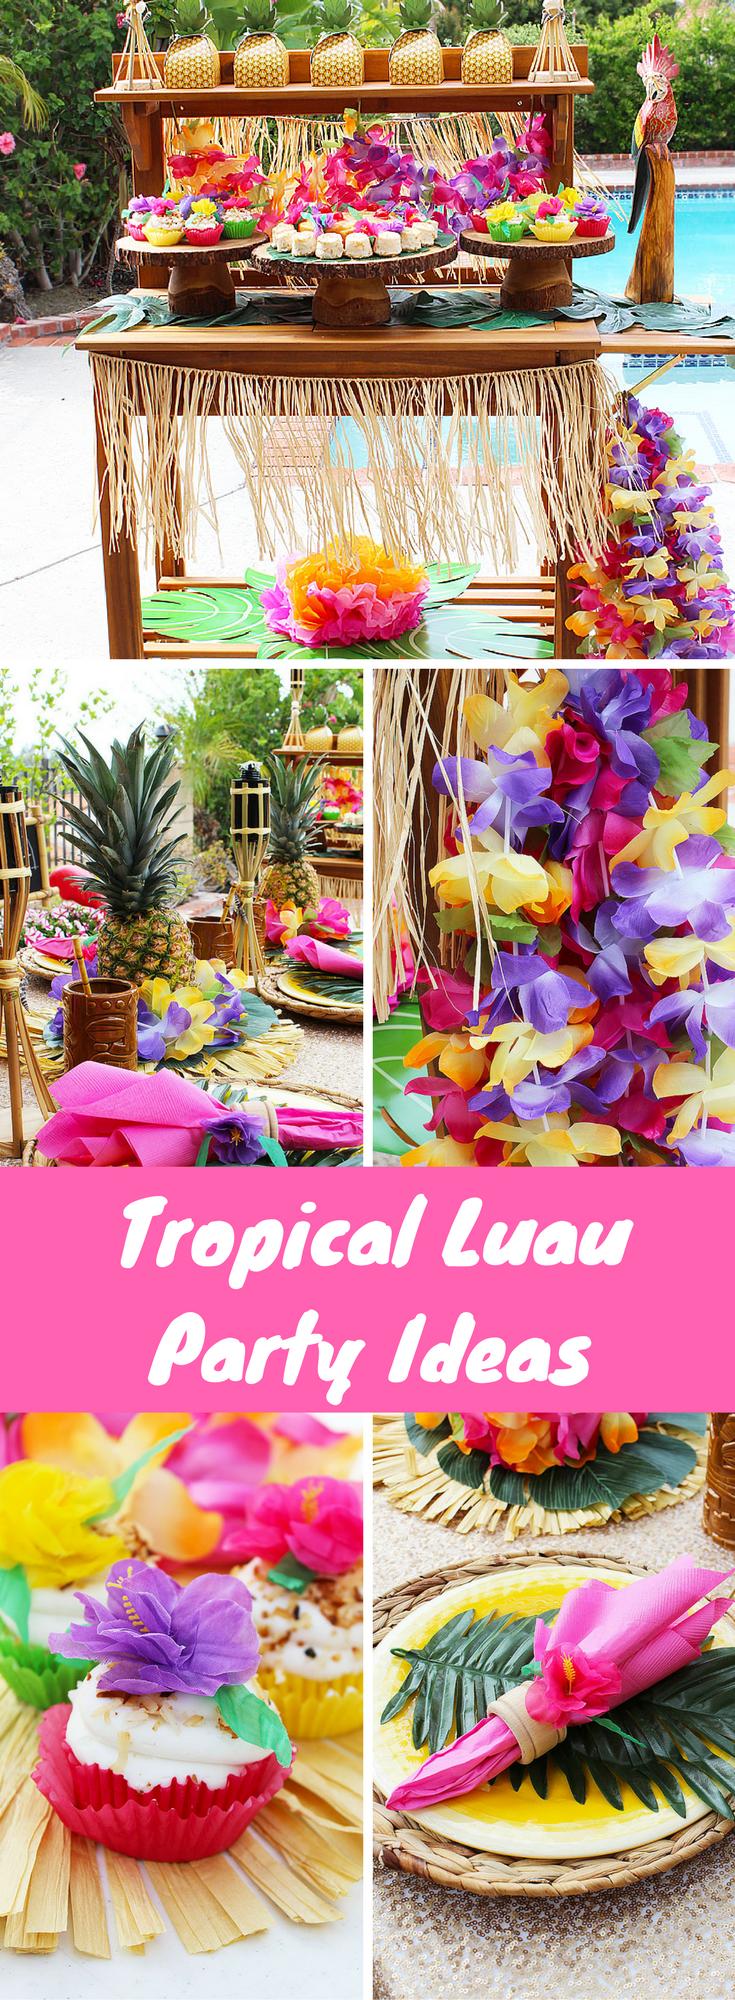 Easy Luau Party Ideas Luau Theme Party Luau Party Decorations